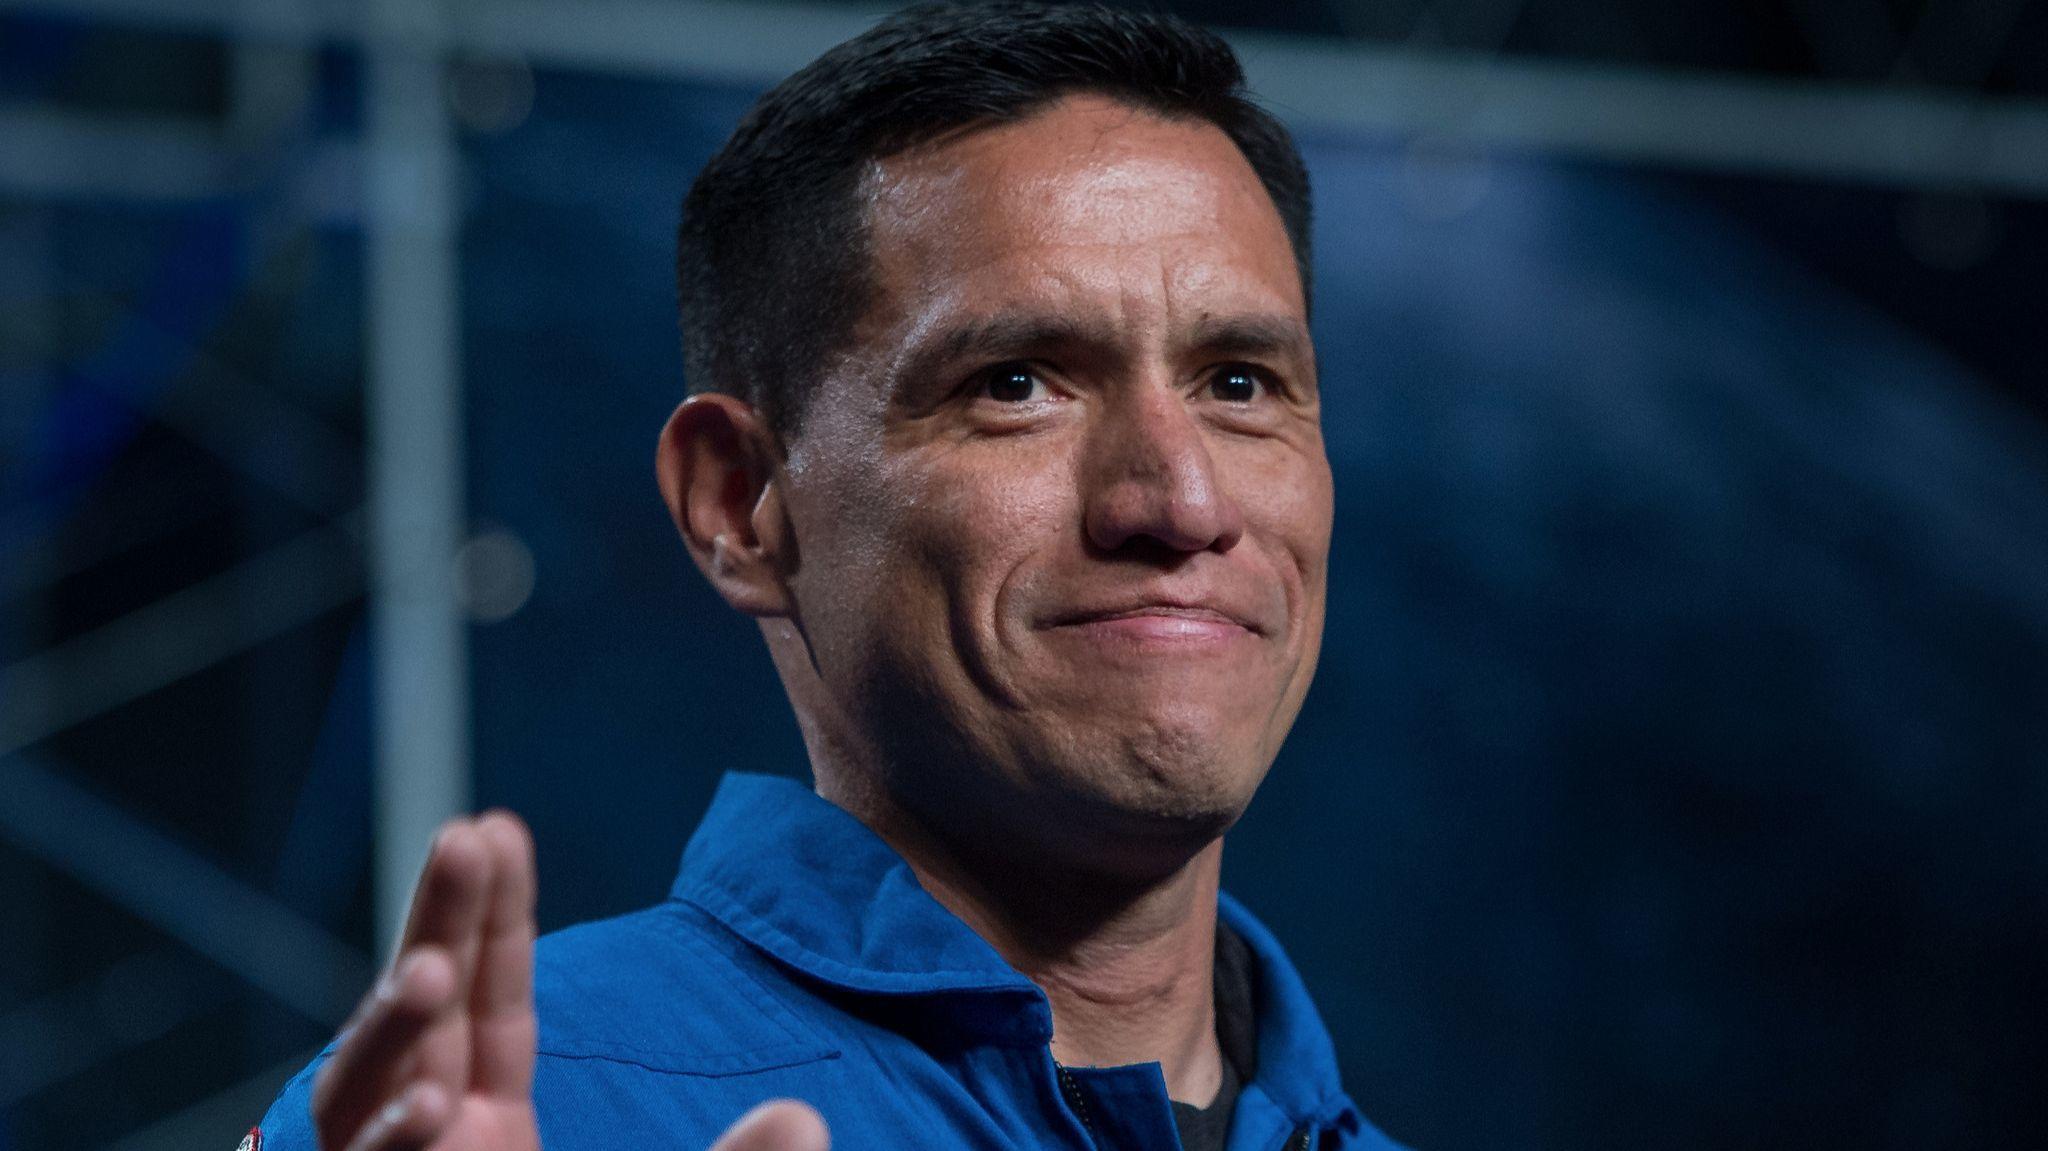 Astronaut Candidate Francisco Rubio